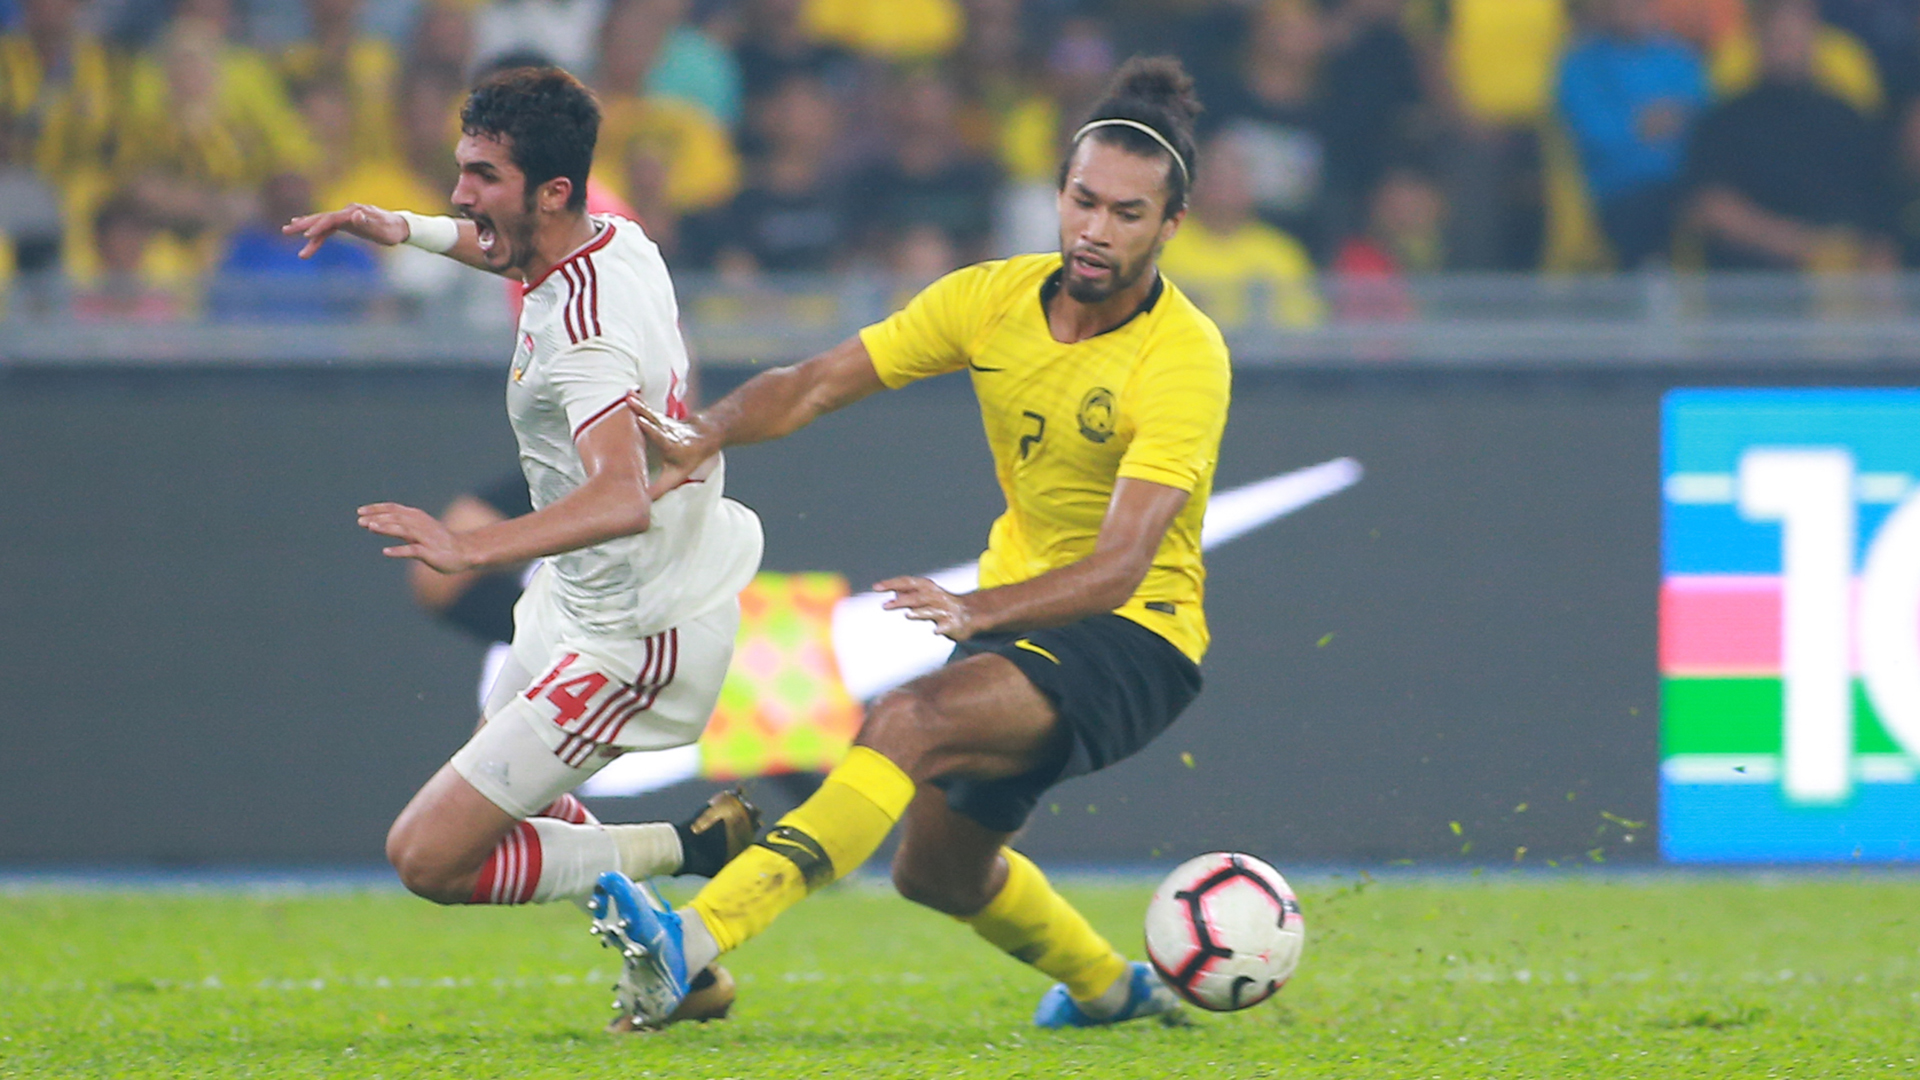 La'Vere Corbin-Ong, Malaysia v UAE, 2022 World Cup Qualifier, 10 Sep 2019